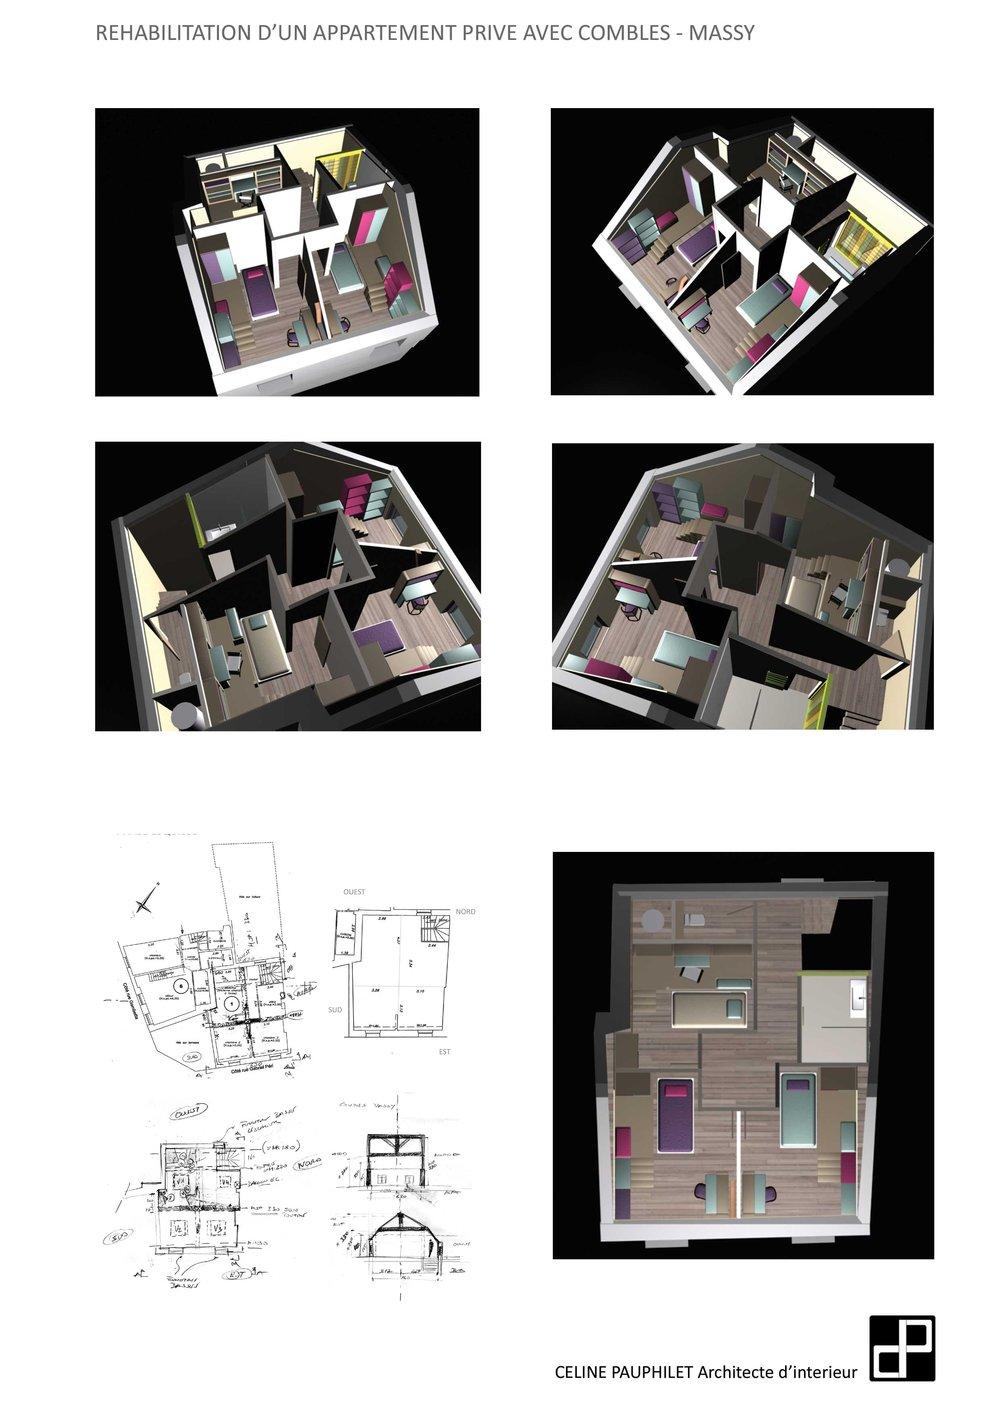 REHABILITATION LOGEMENT PRIVE Massy   Projet 2012 13